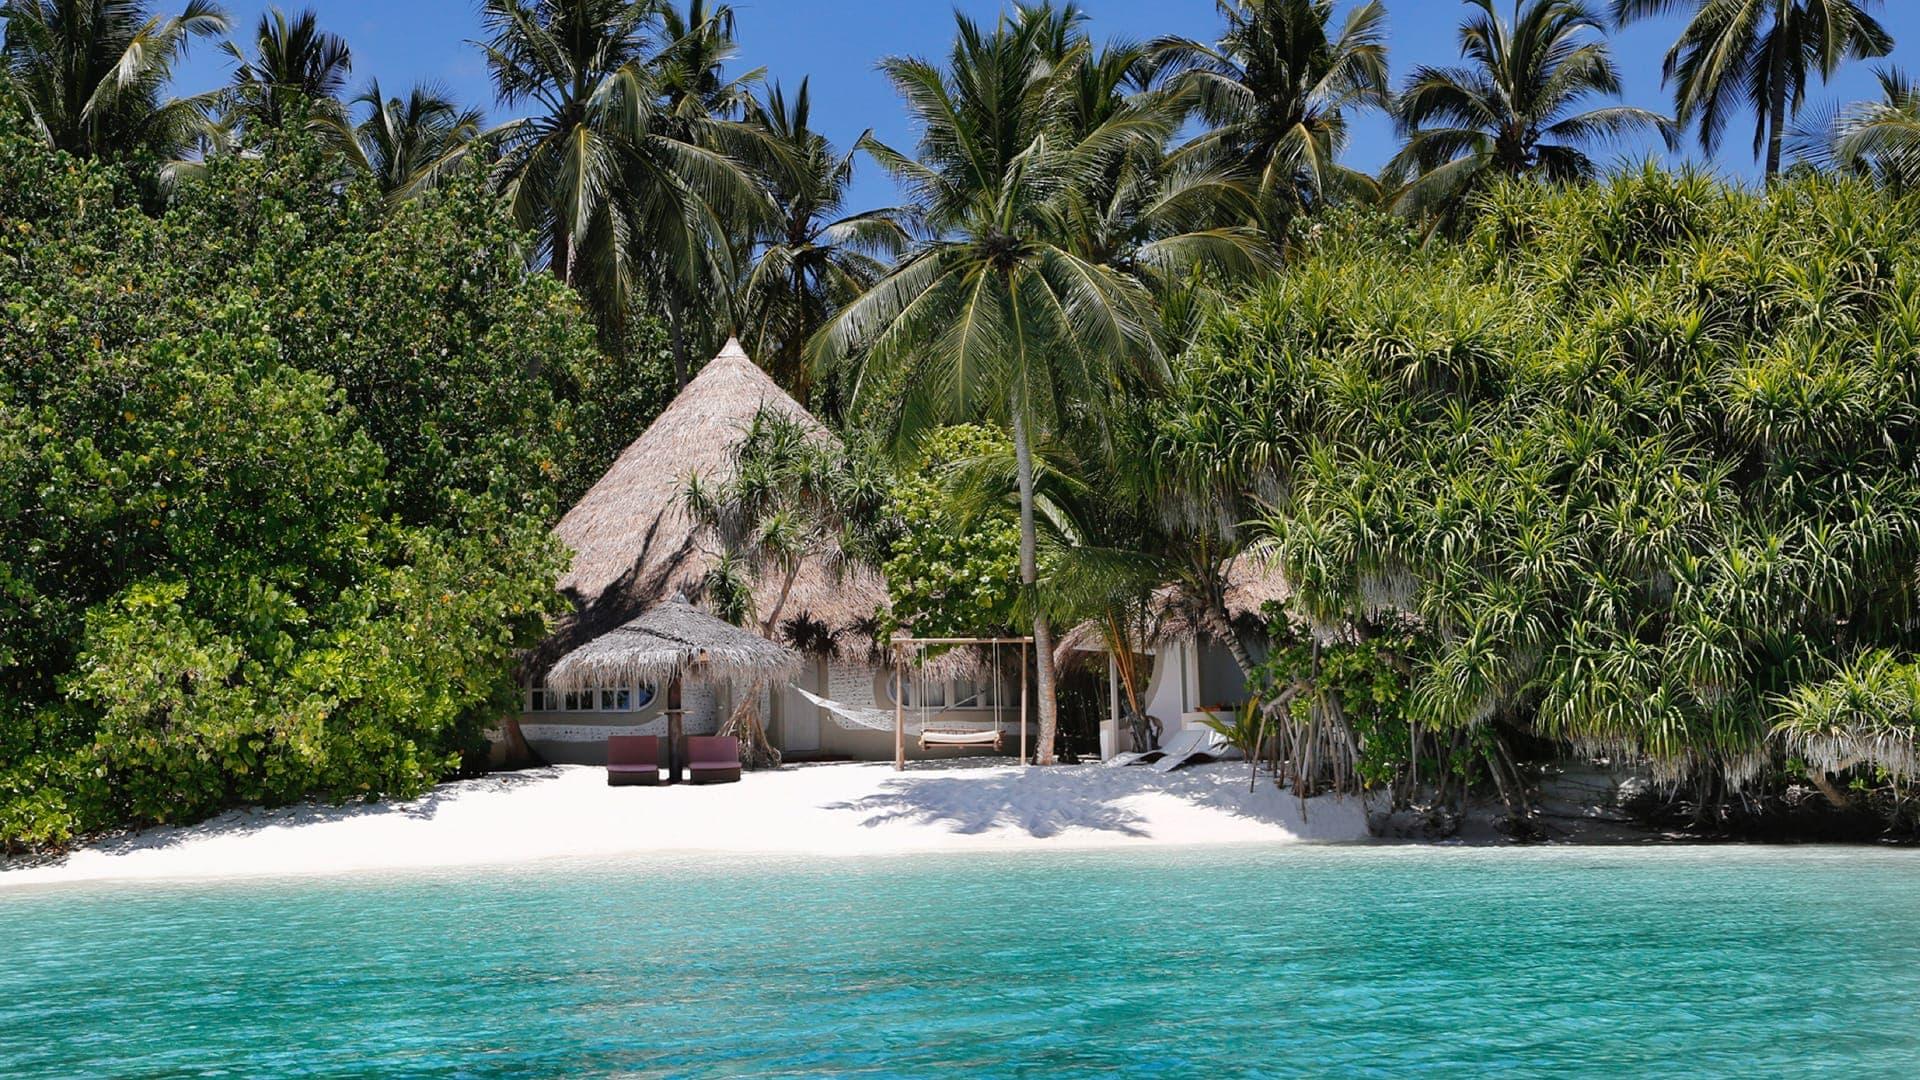 Nika Island resort a partire da Euro 1750 p.p.